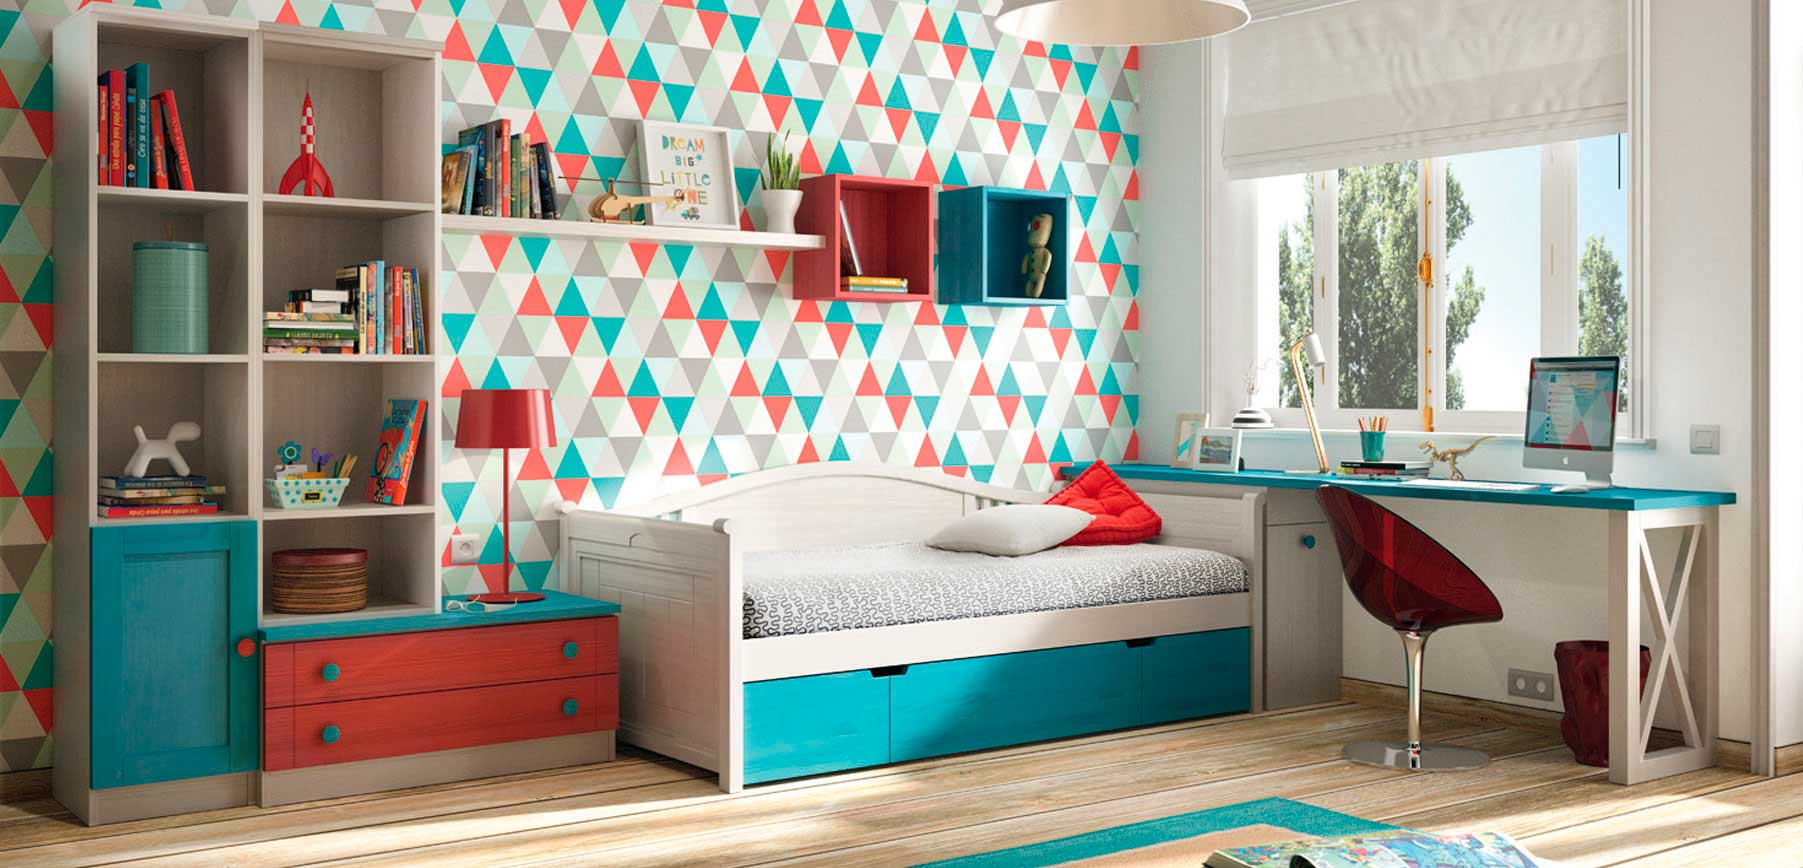 Muebles GRUPOSEYS - Muebles | Furniture | Meubles | мебель seys-7-optim Inicio